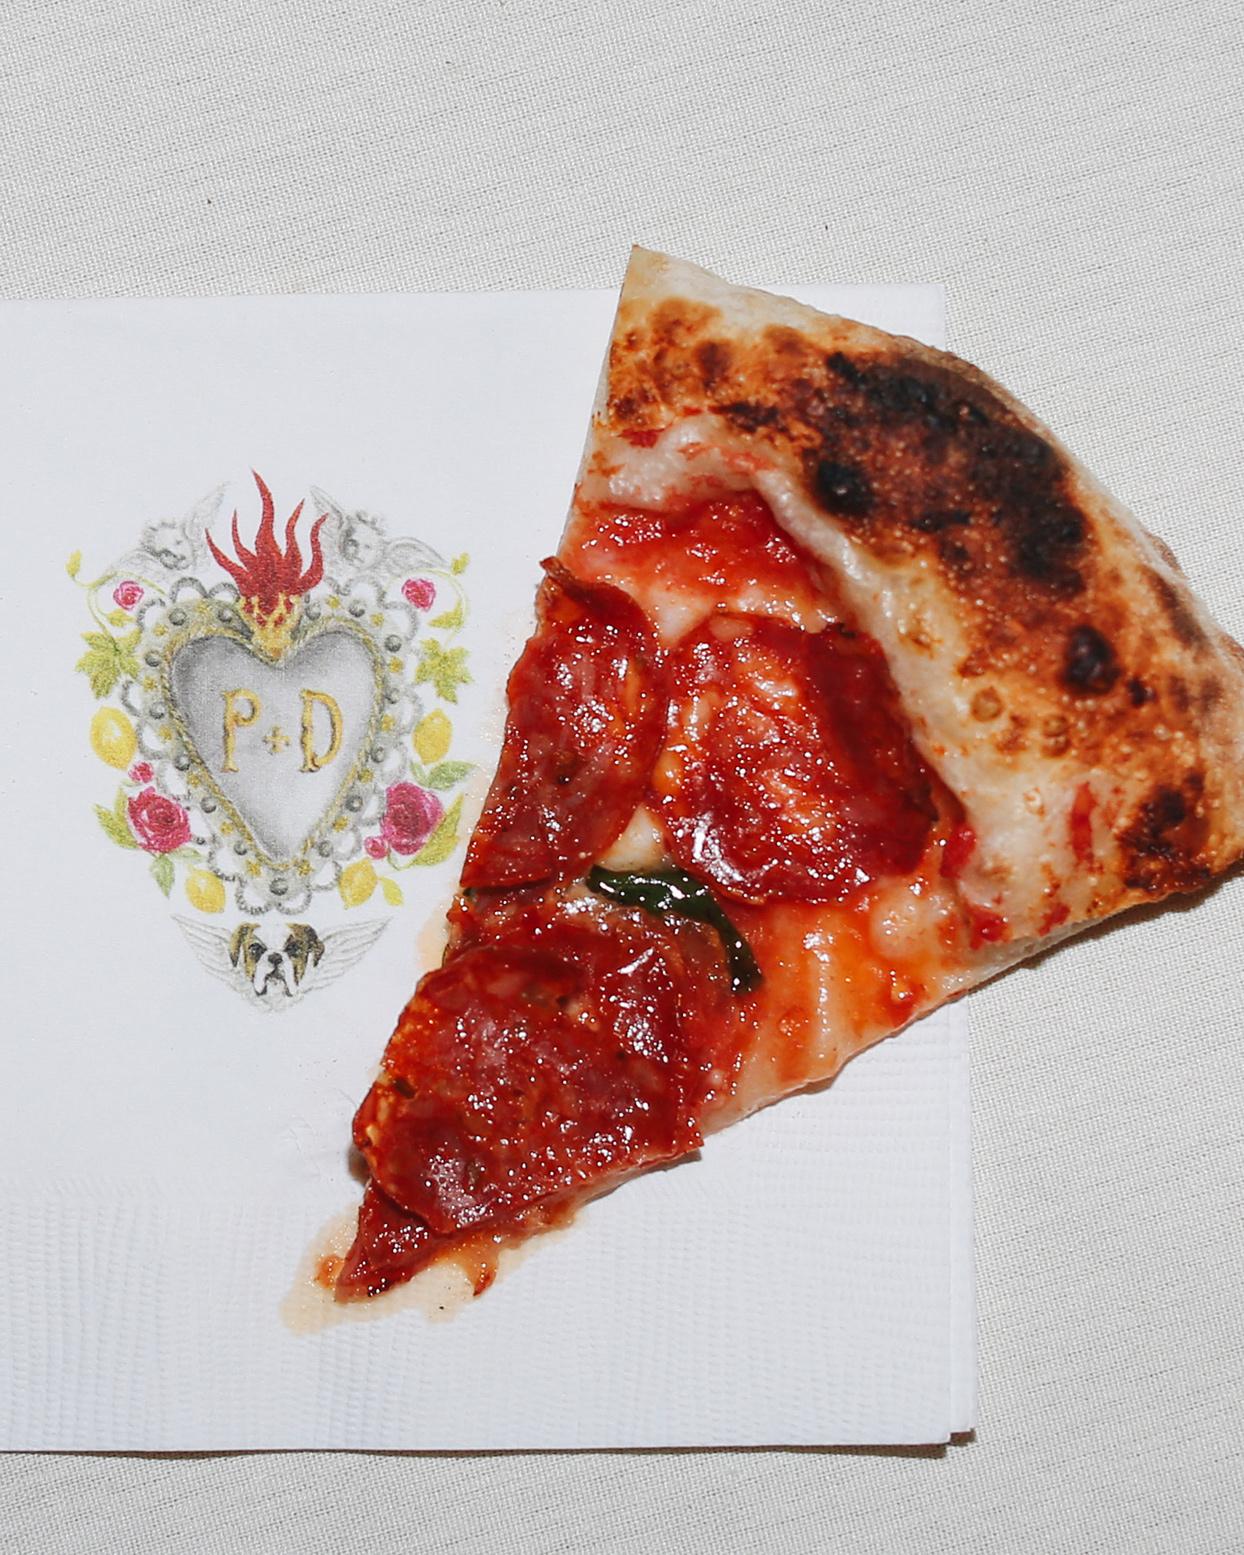 pia davide wedding pizza slice on napkin with crest